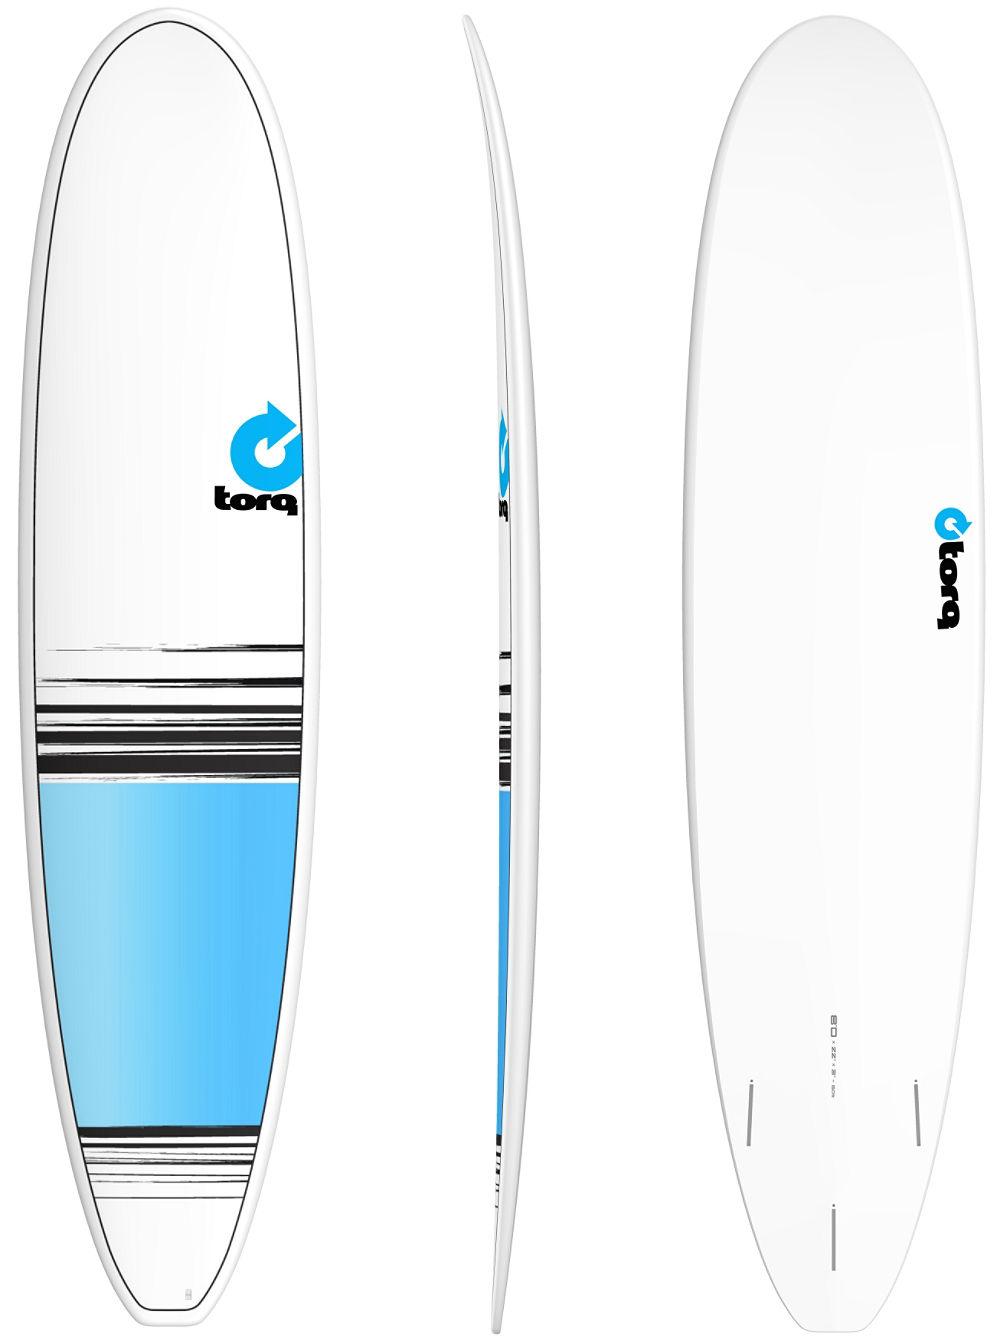 Compra torq tet 8 0 longboard tavola da surf online su - Misure tavole da surf ...